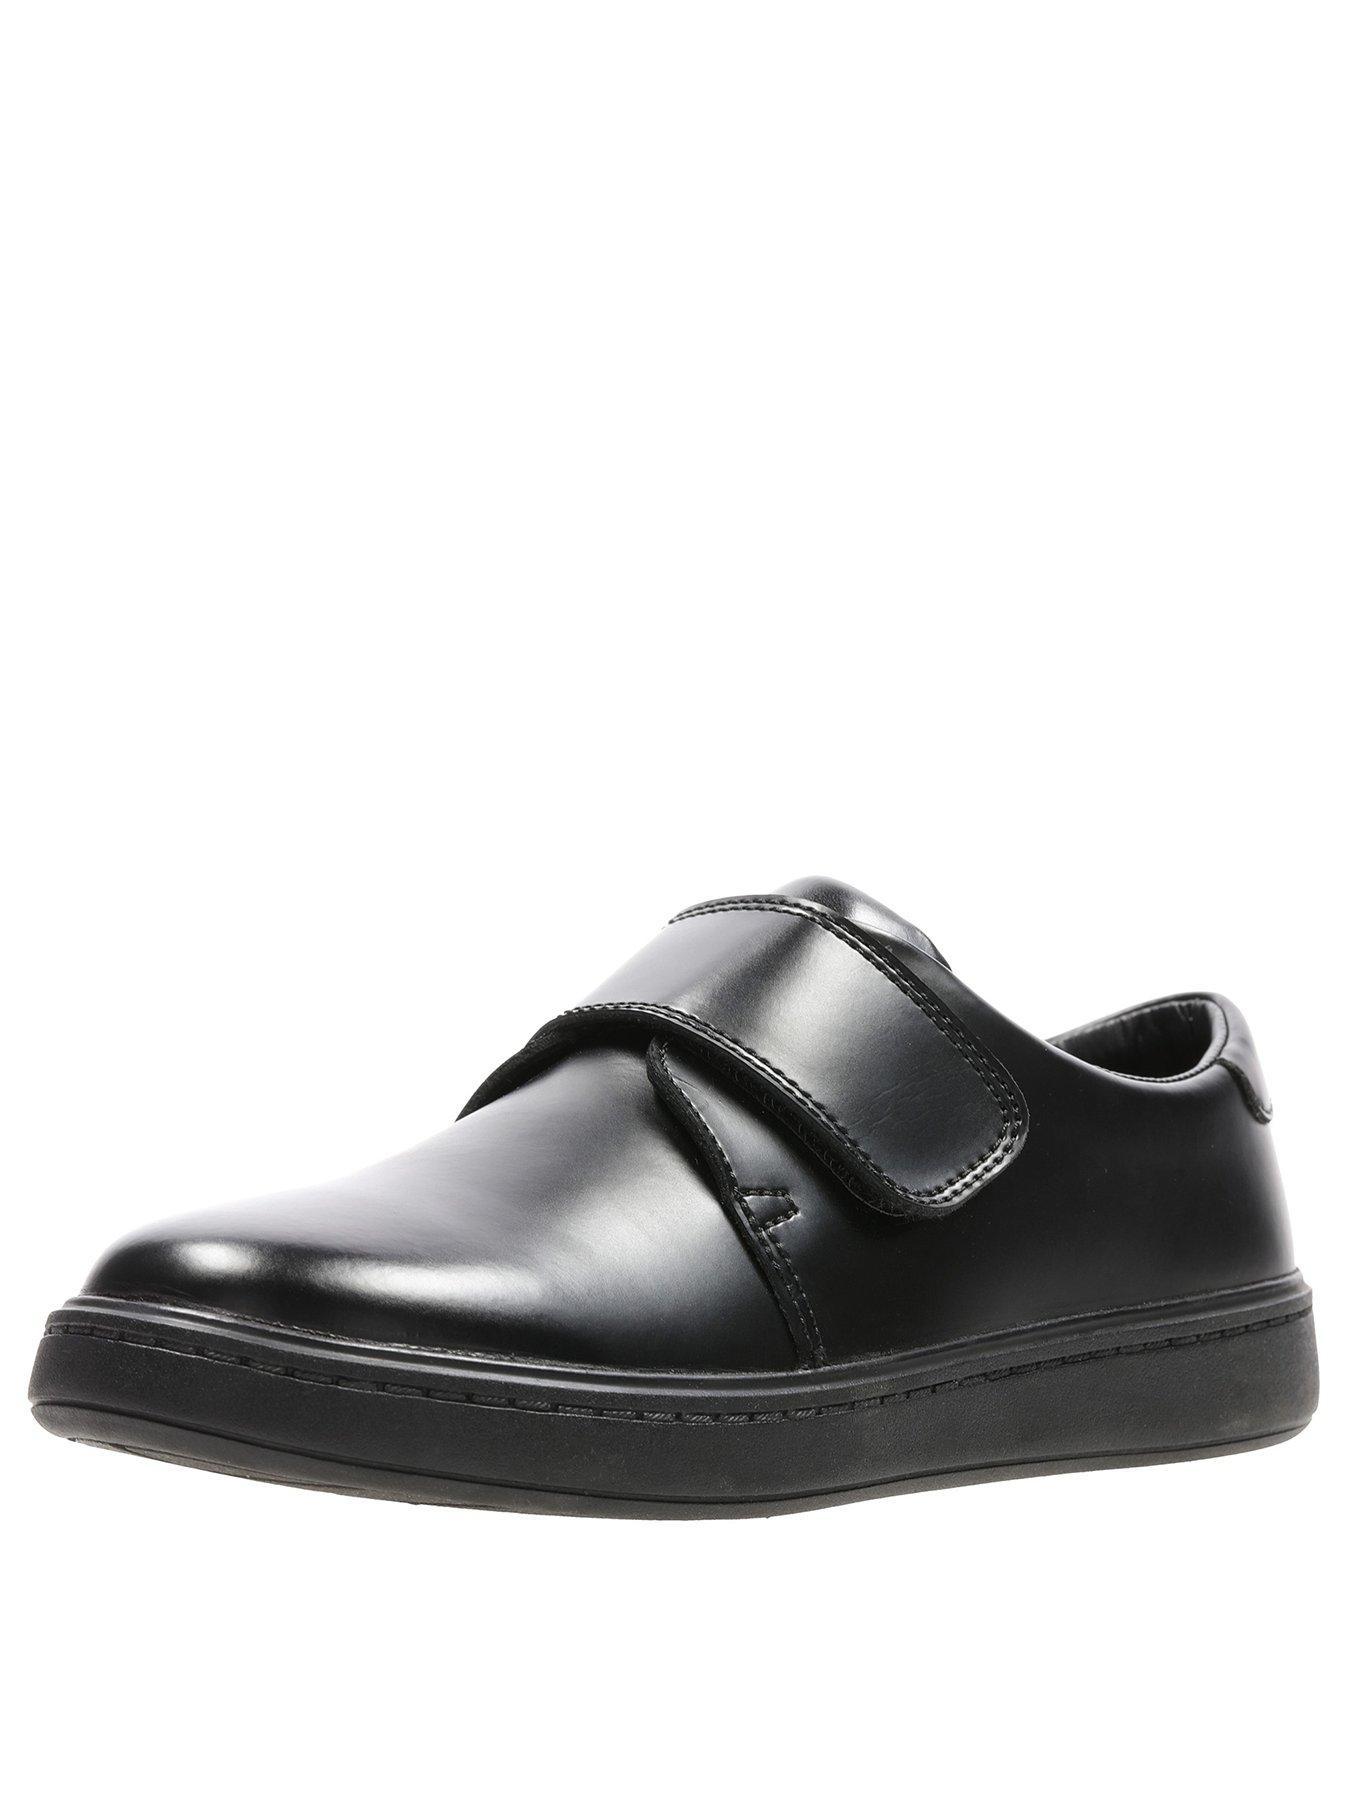 Hula Thrill Boys Black Hook /& Loops Clarks School Formal Shoes